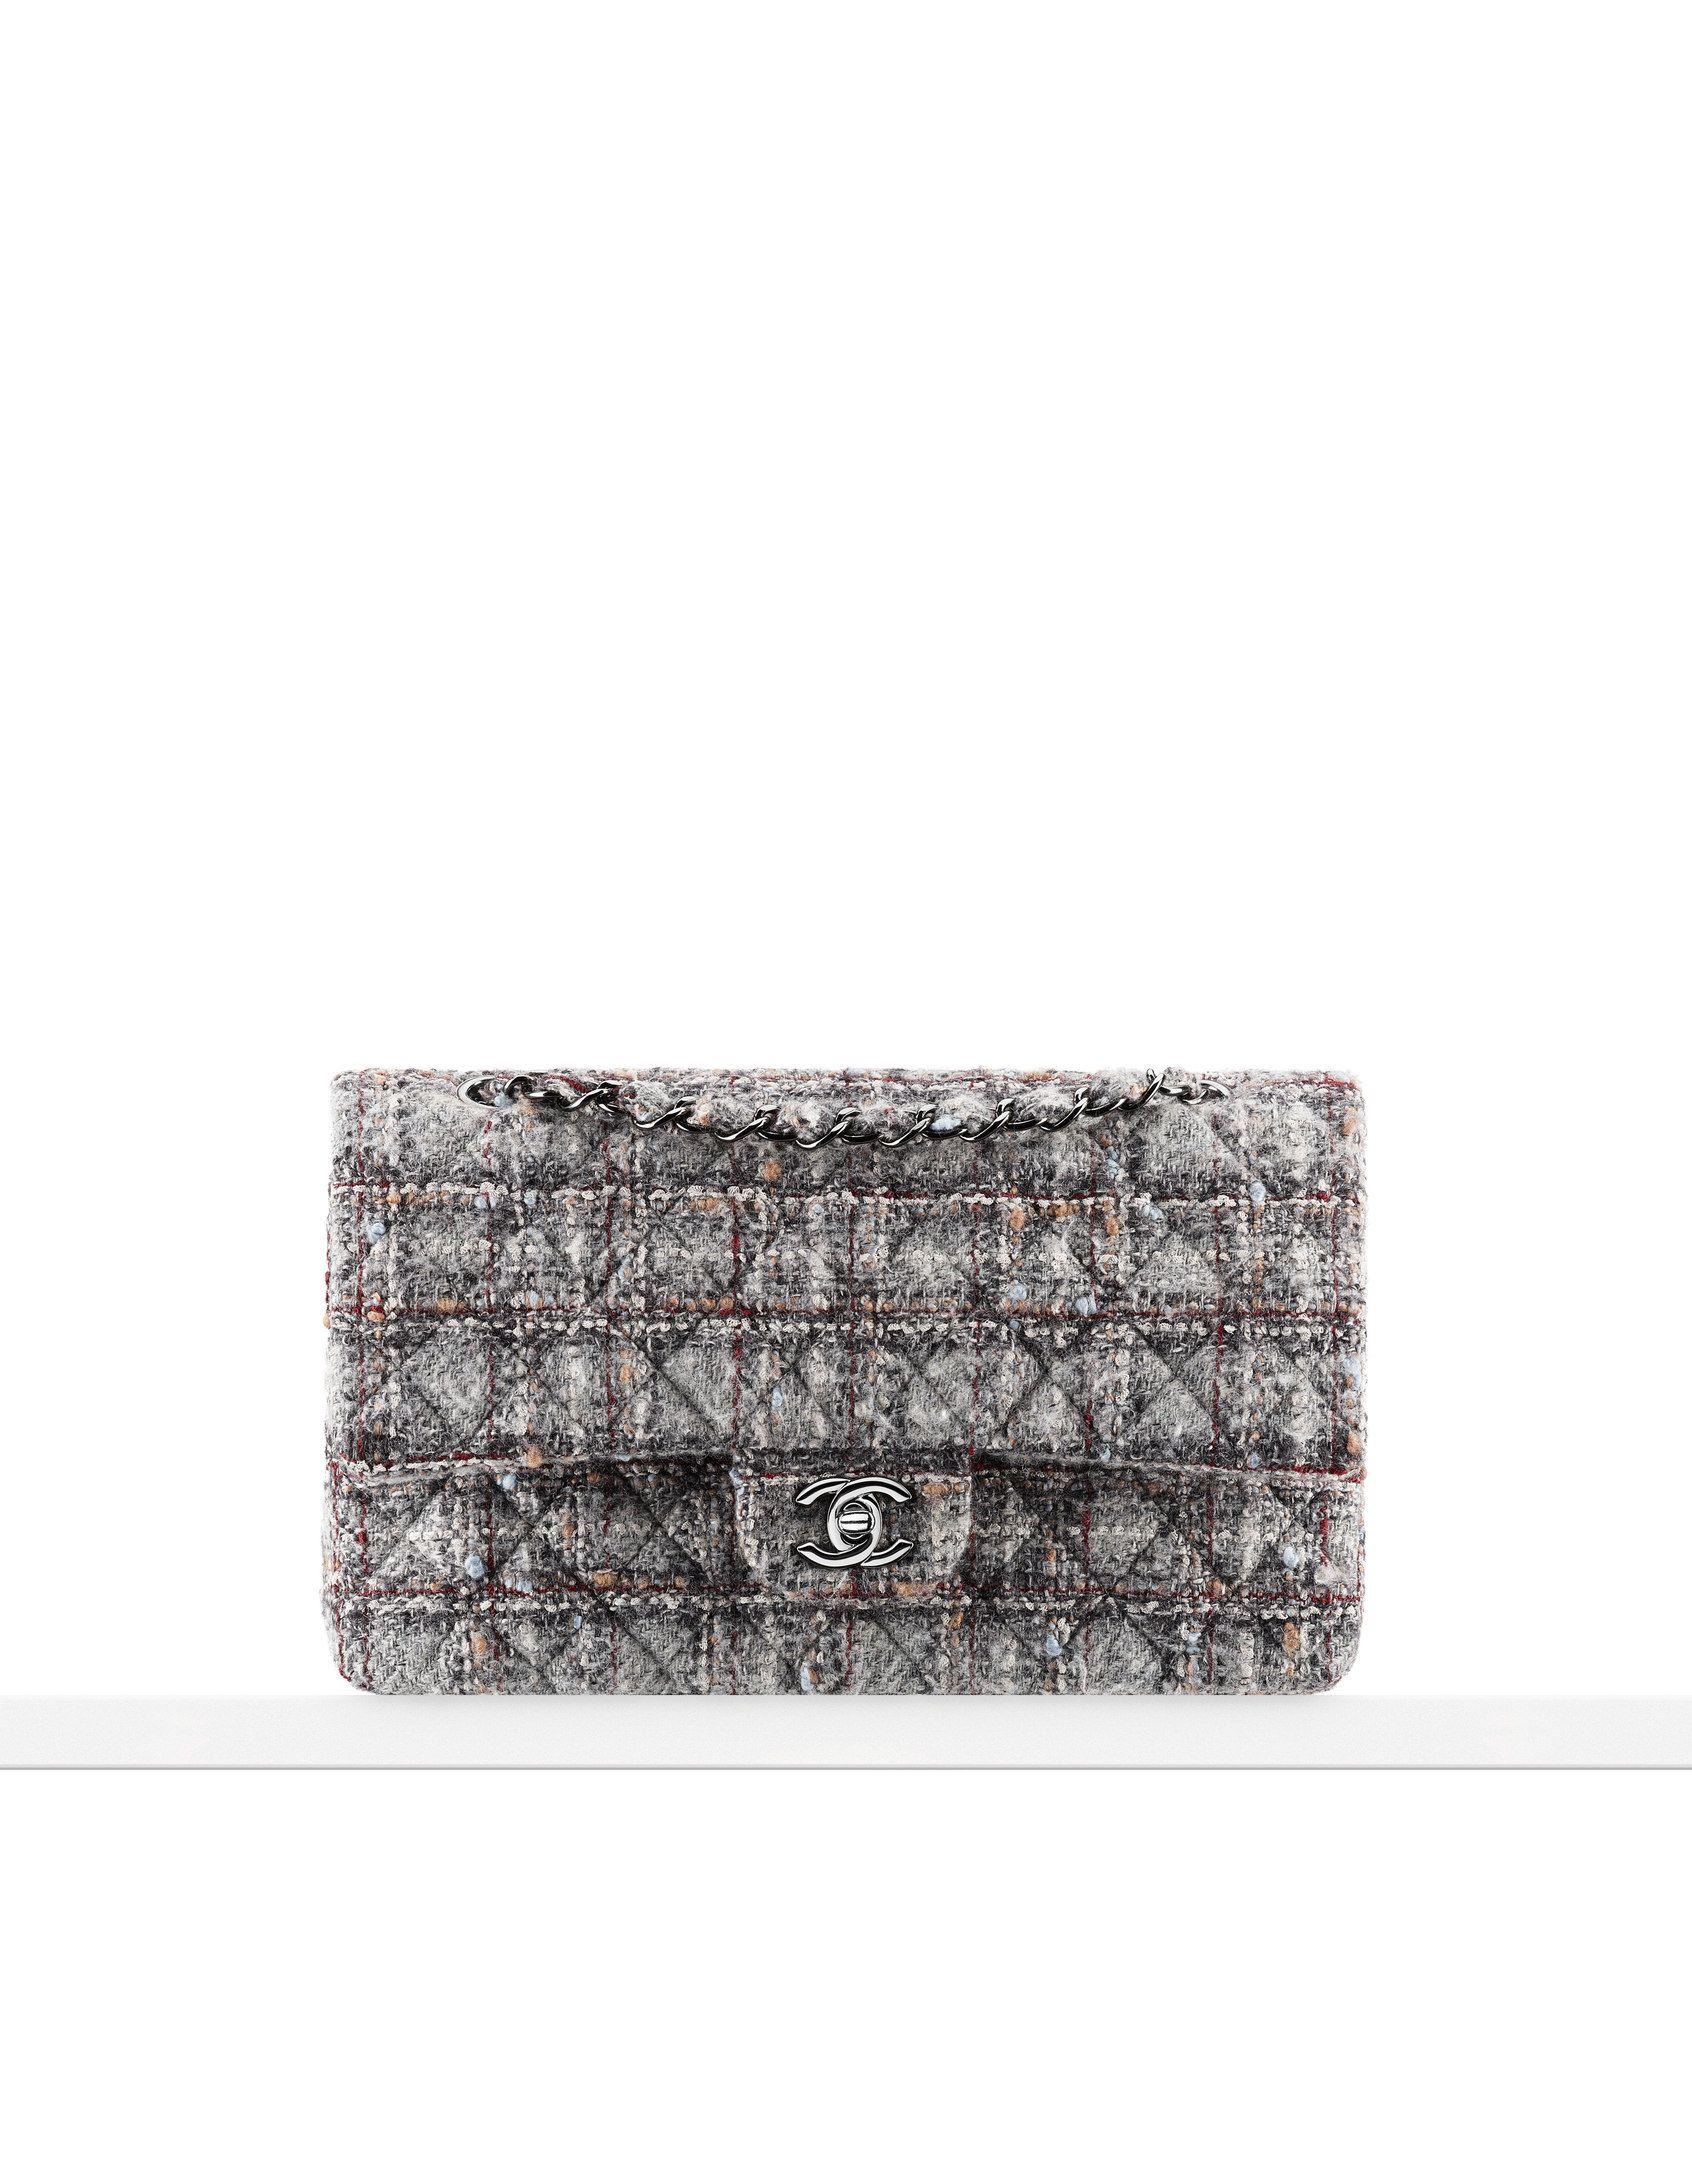 553e543044d0de Tweed classic flap bag - CHANEL | Bags | Chanel handbags, Chanel ...